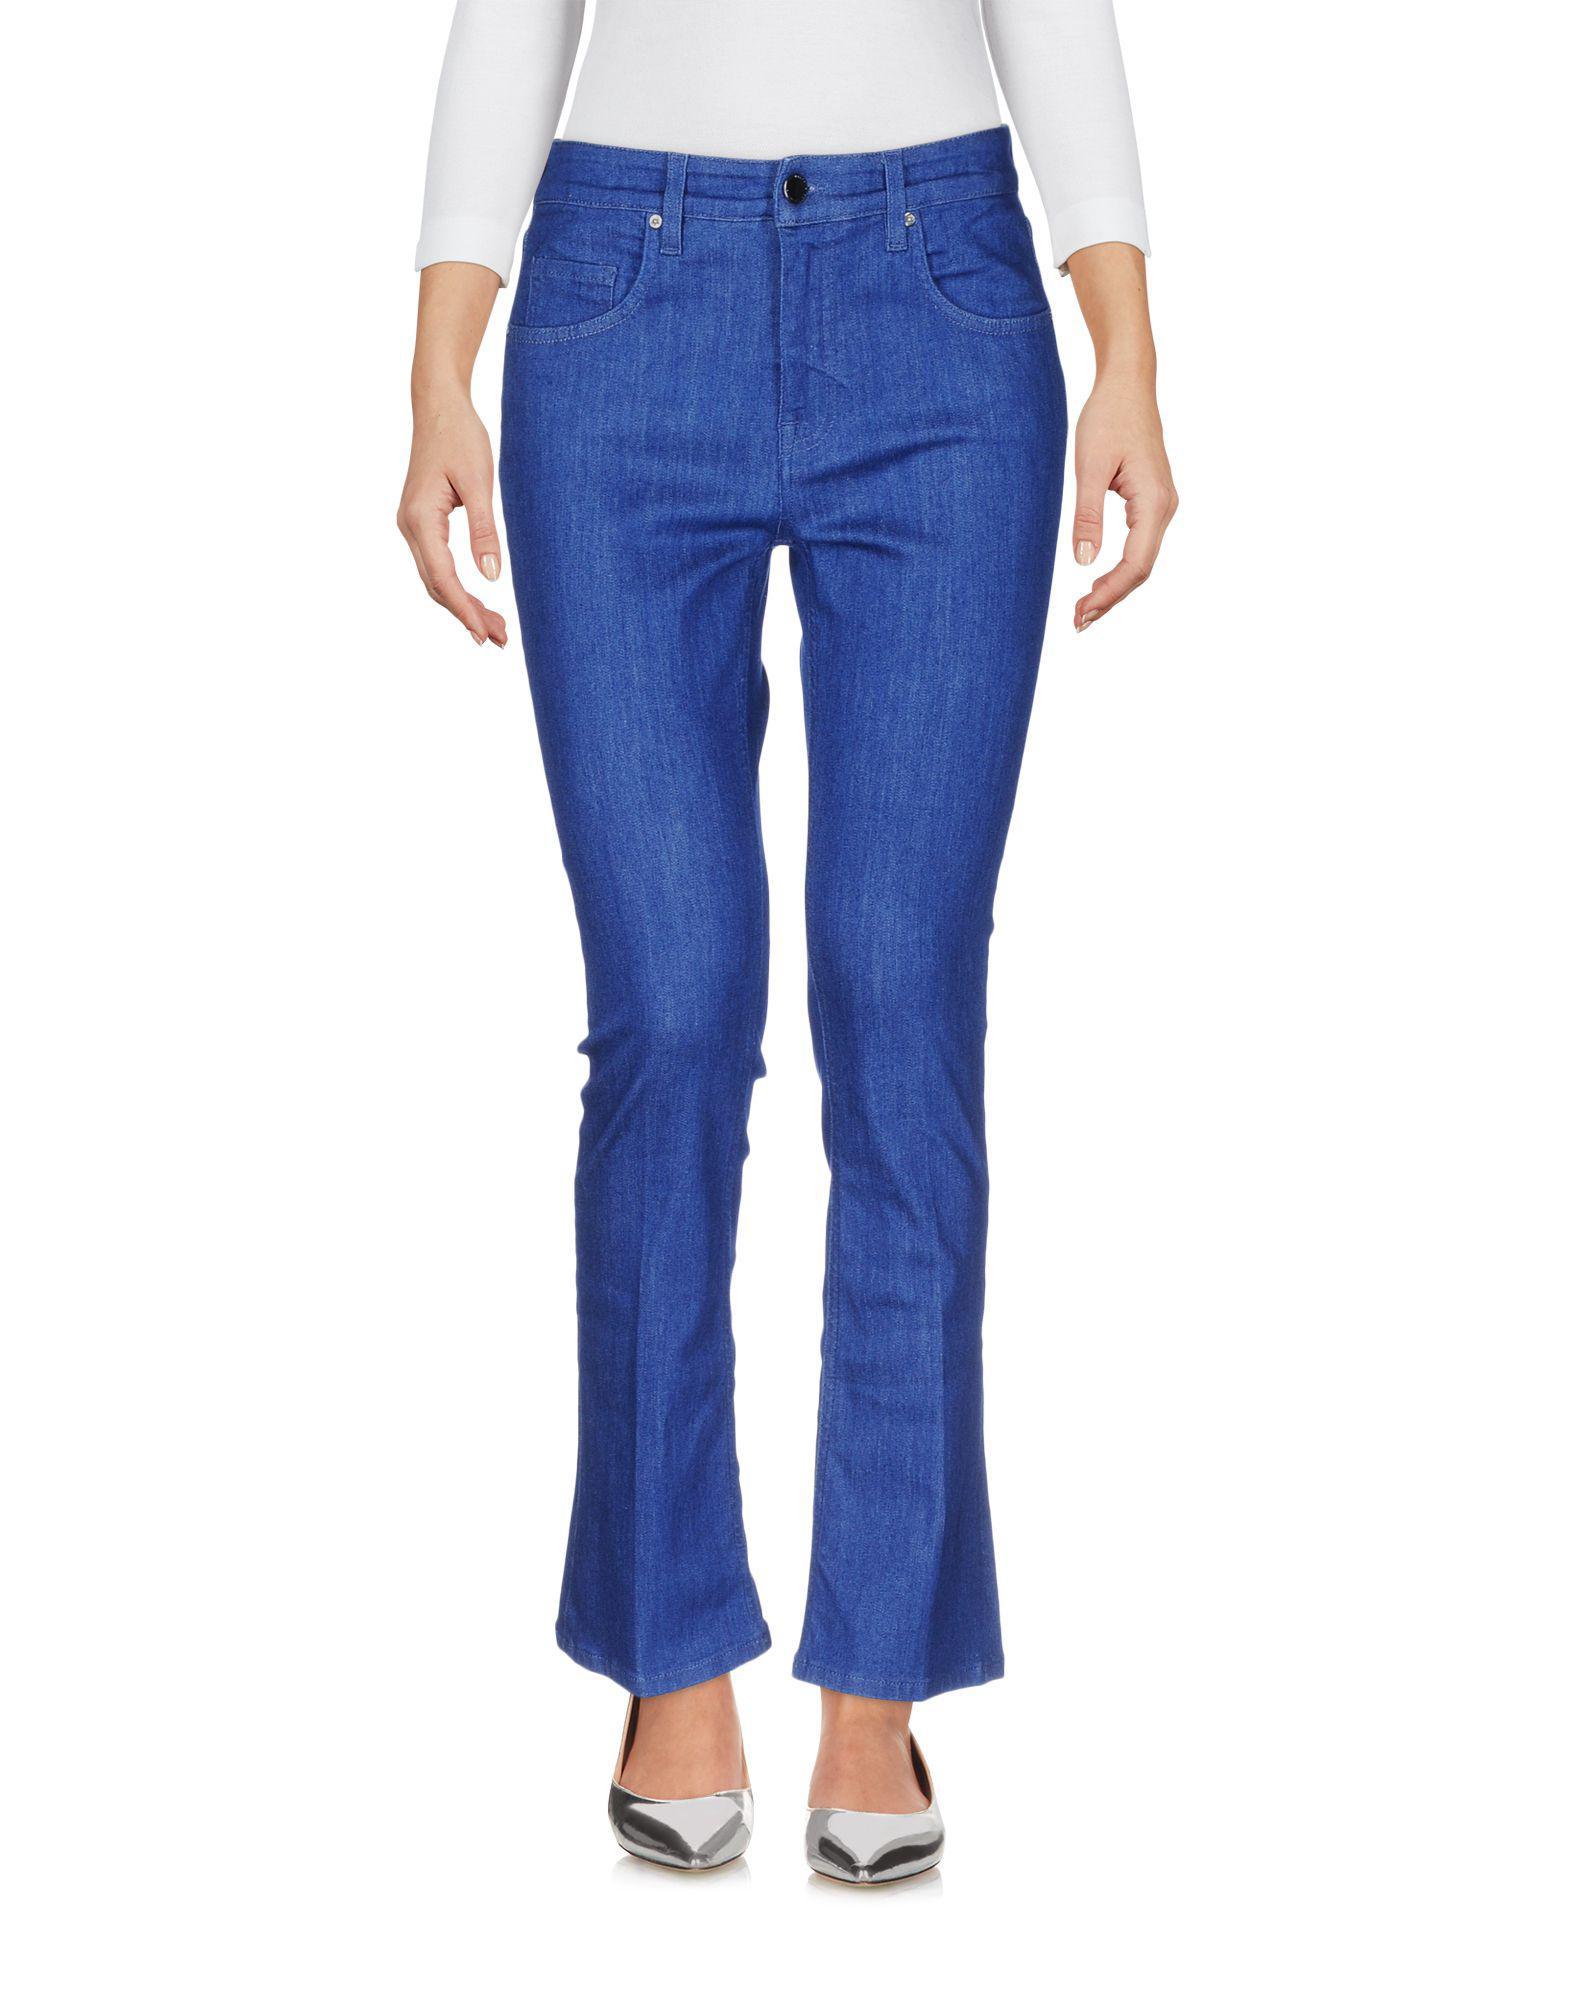 Victoria, Victoria Beckham Woman Cropped Appliquéd Bootcut Jeans Light Denim Size 25 Victoria Beckham